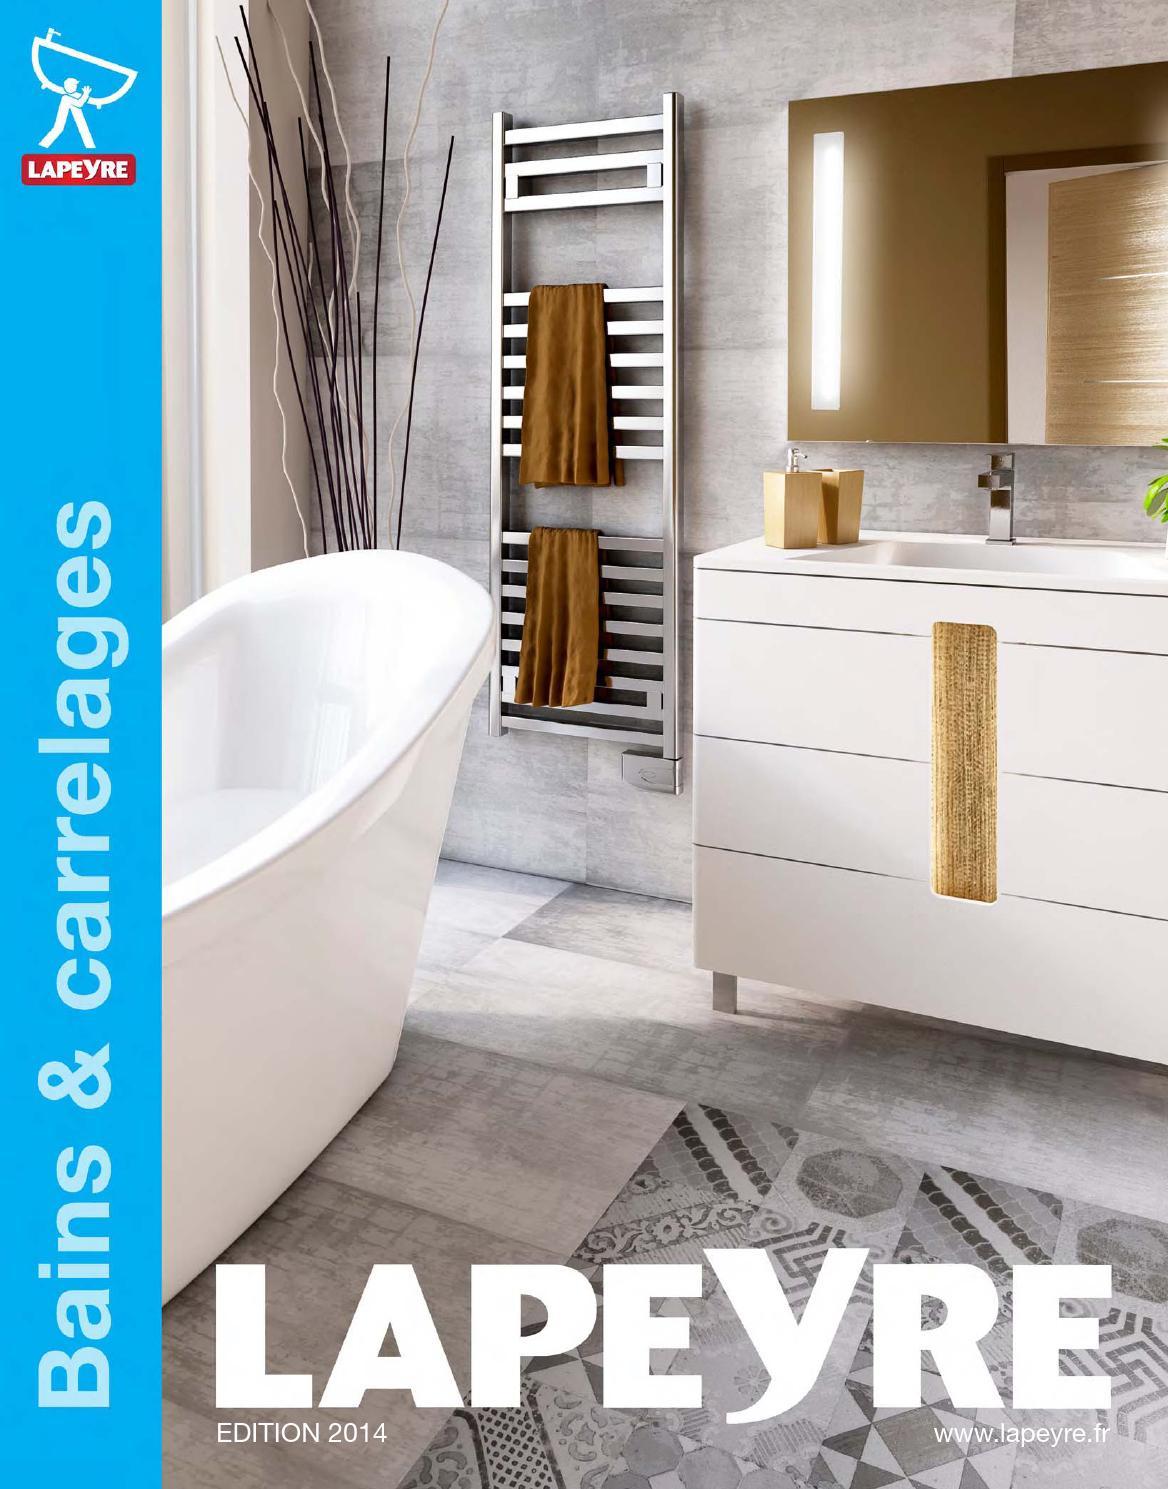 New Salle De Bain Lapeyre Ou Leroy Merlin